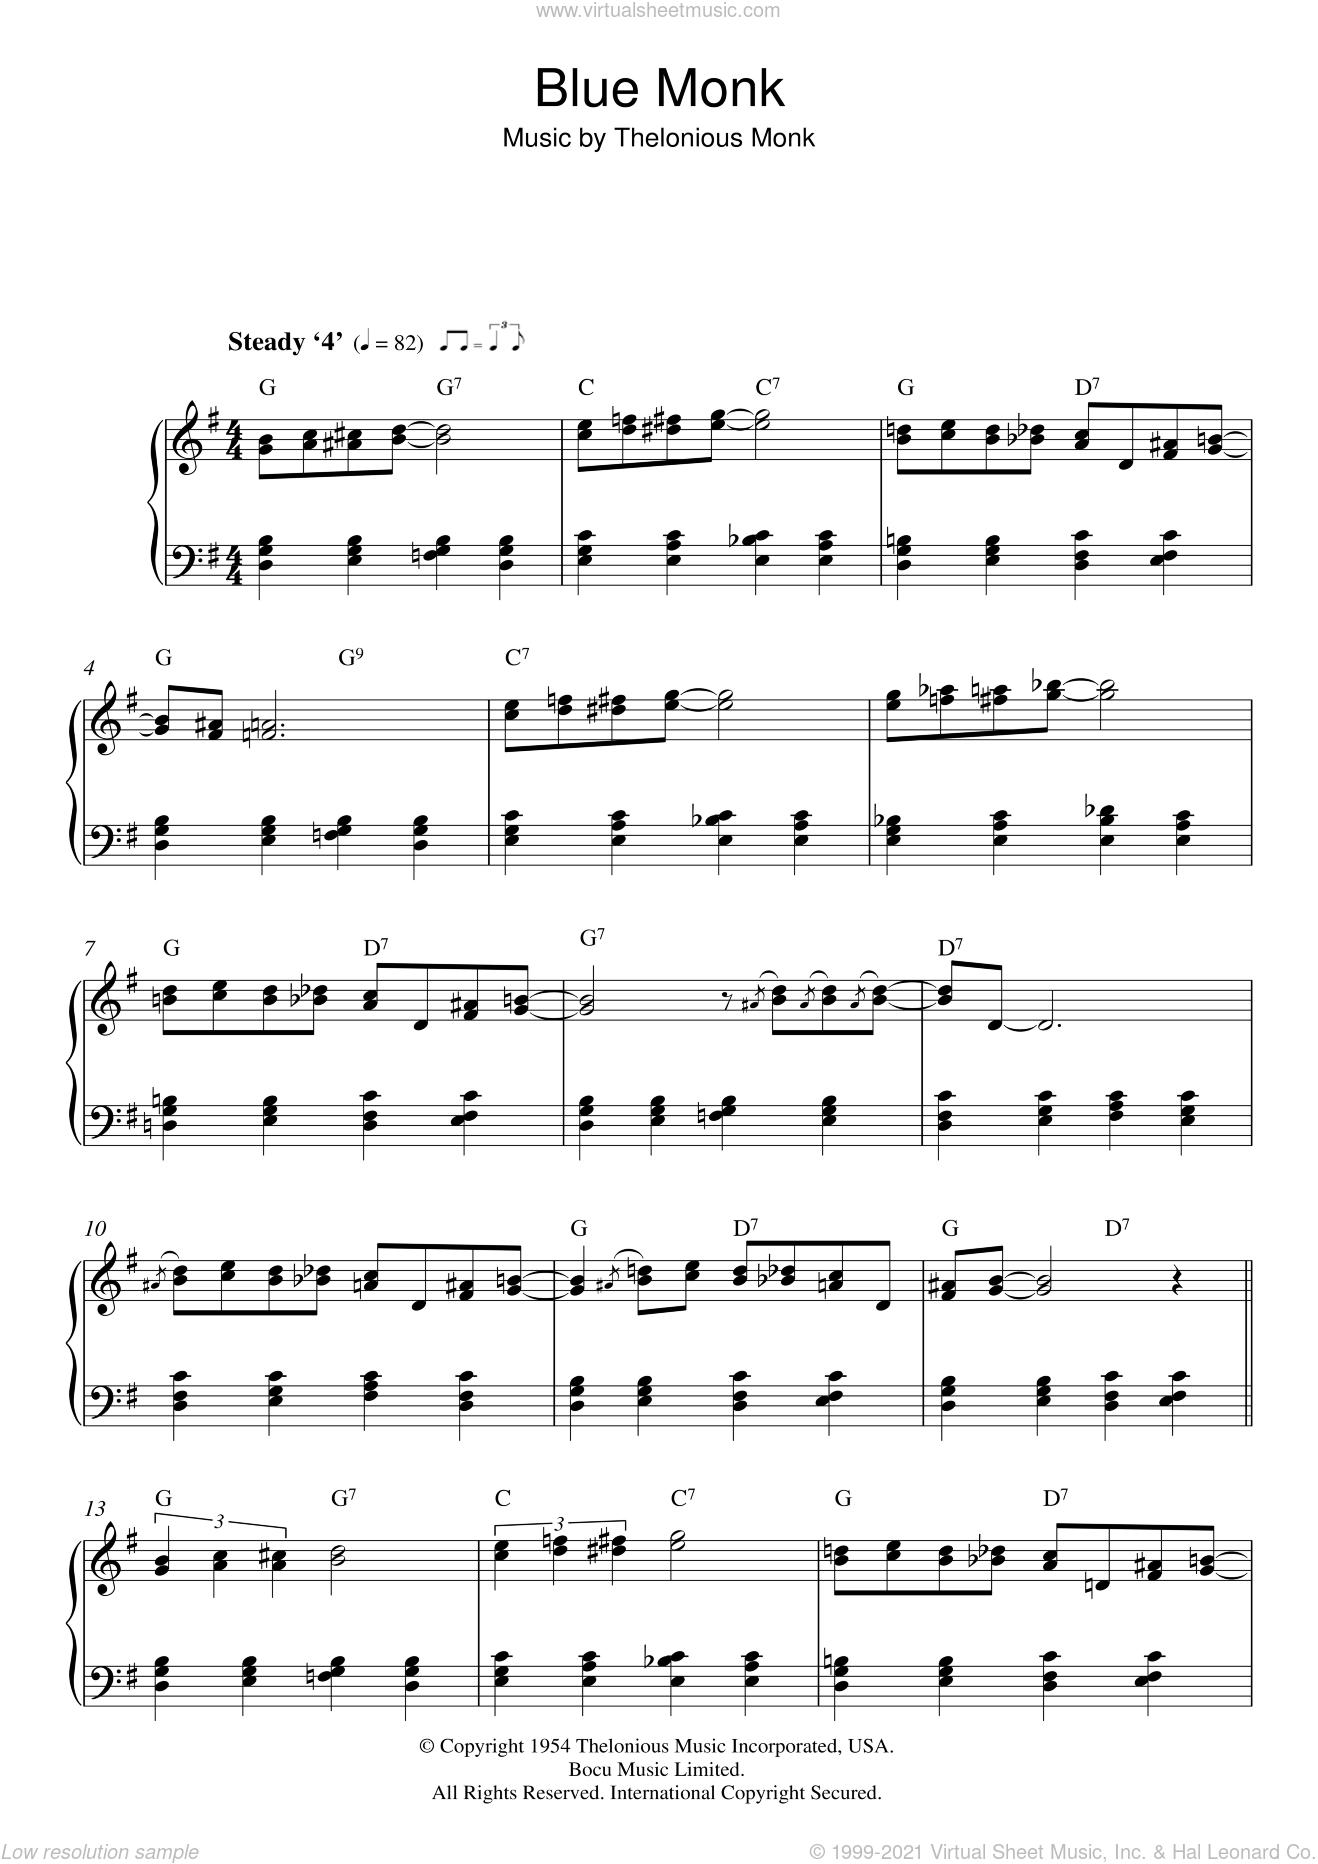 Monk - Blue Monk sheet music (intermediate) for piano solo [PDF]